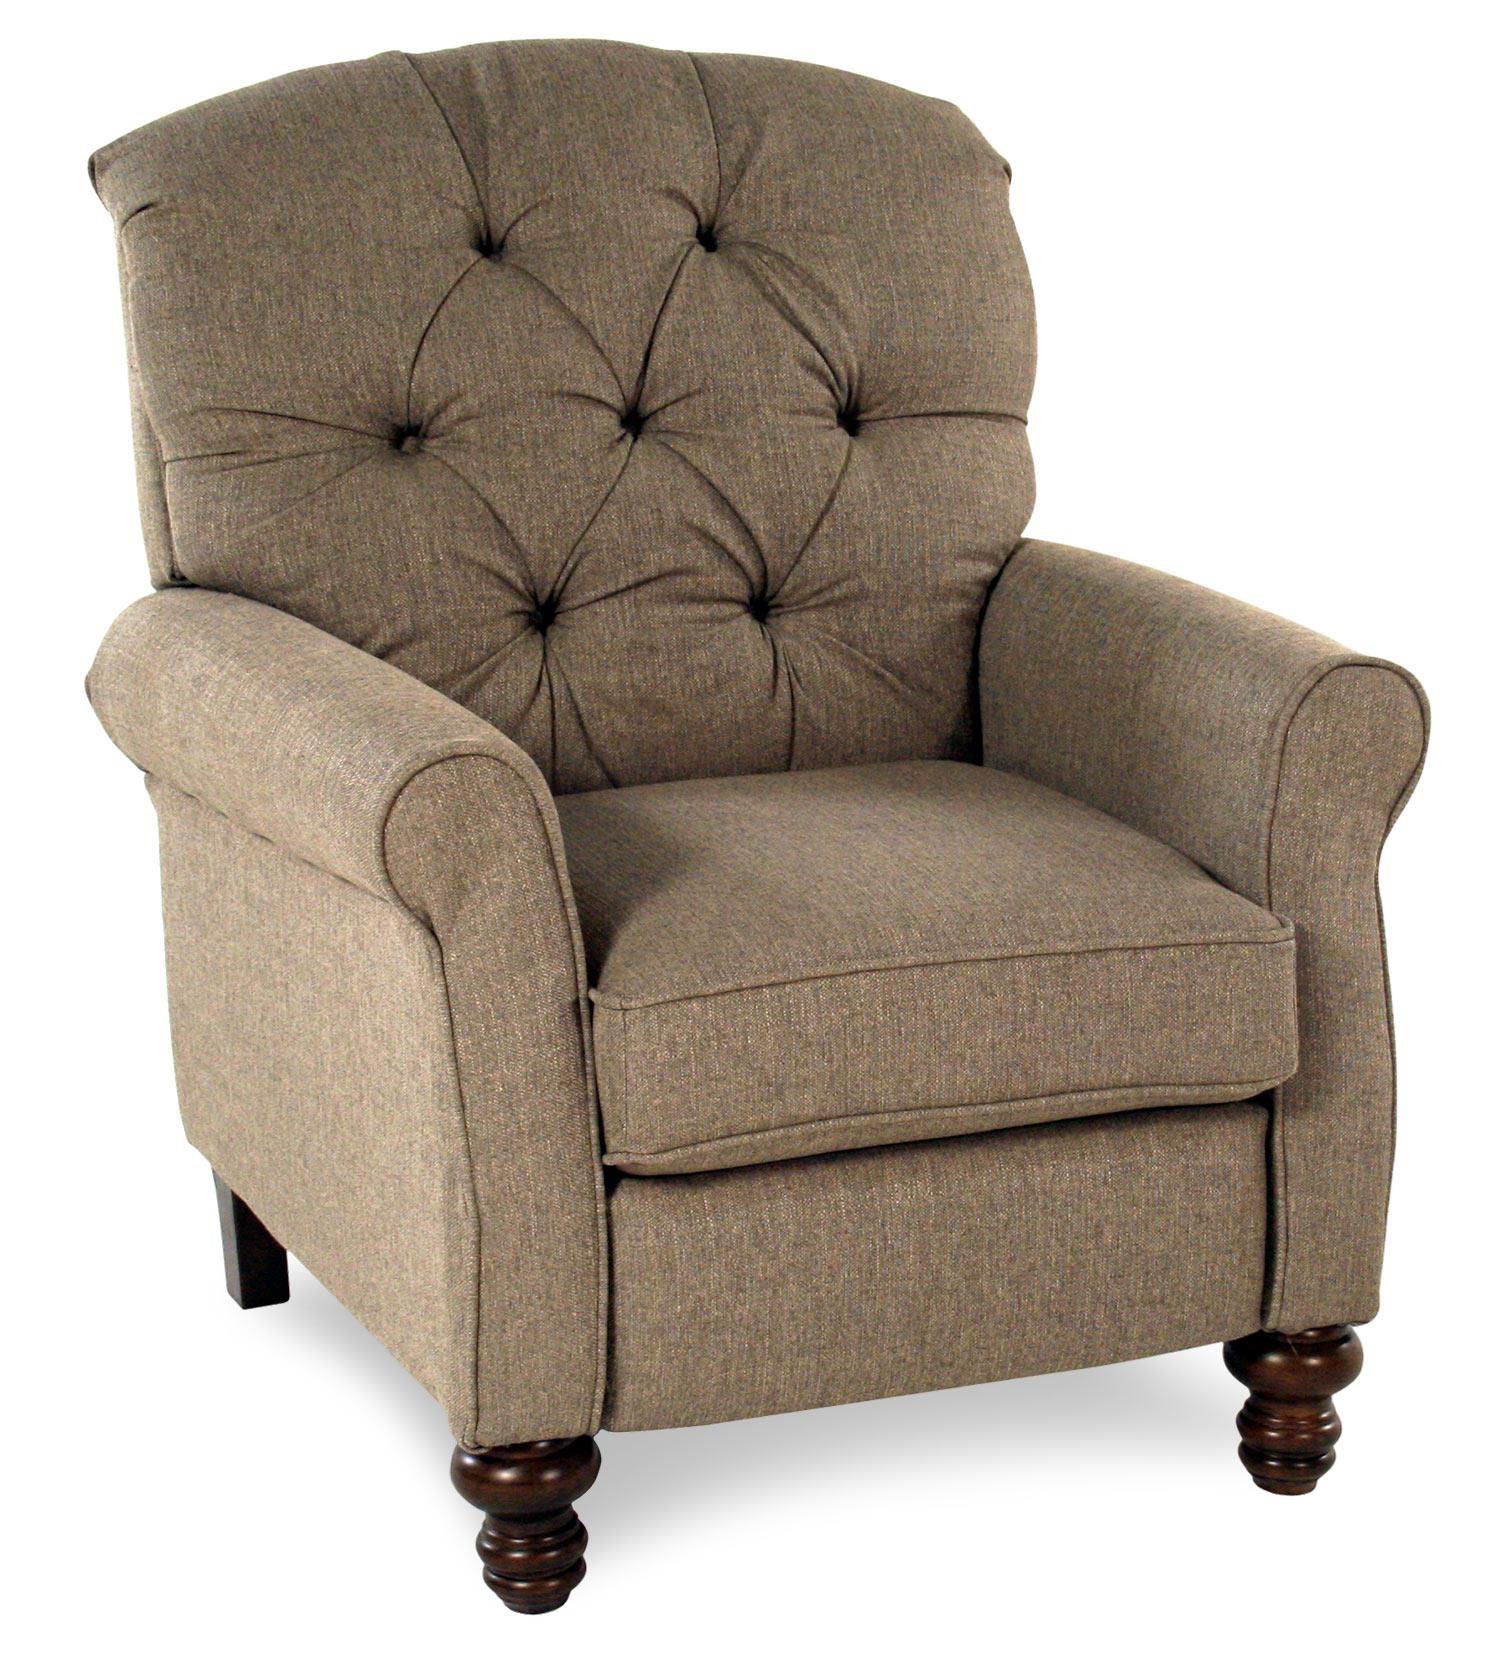 recliner furniture clearance oak chair chocolatelrg olympian recliners serta center